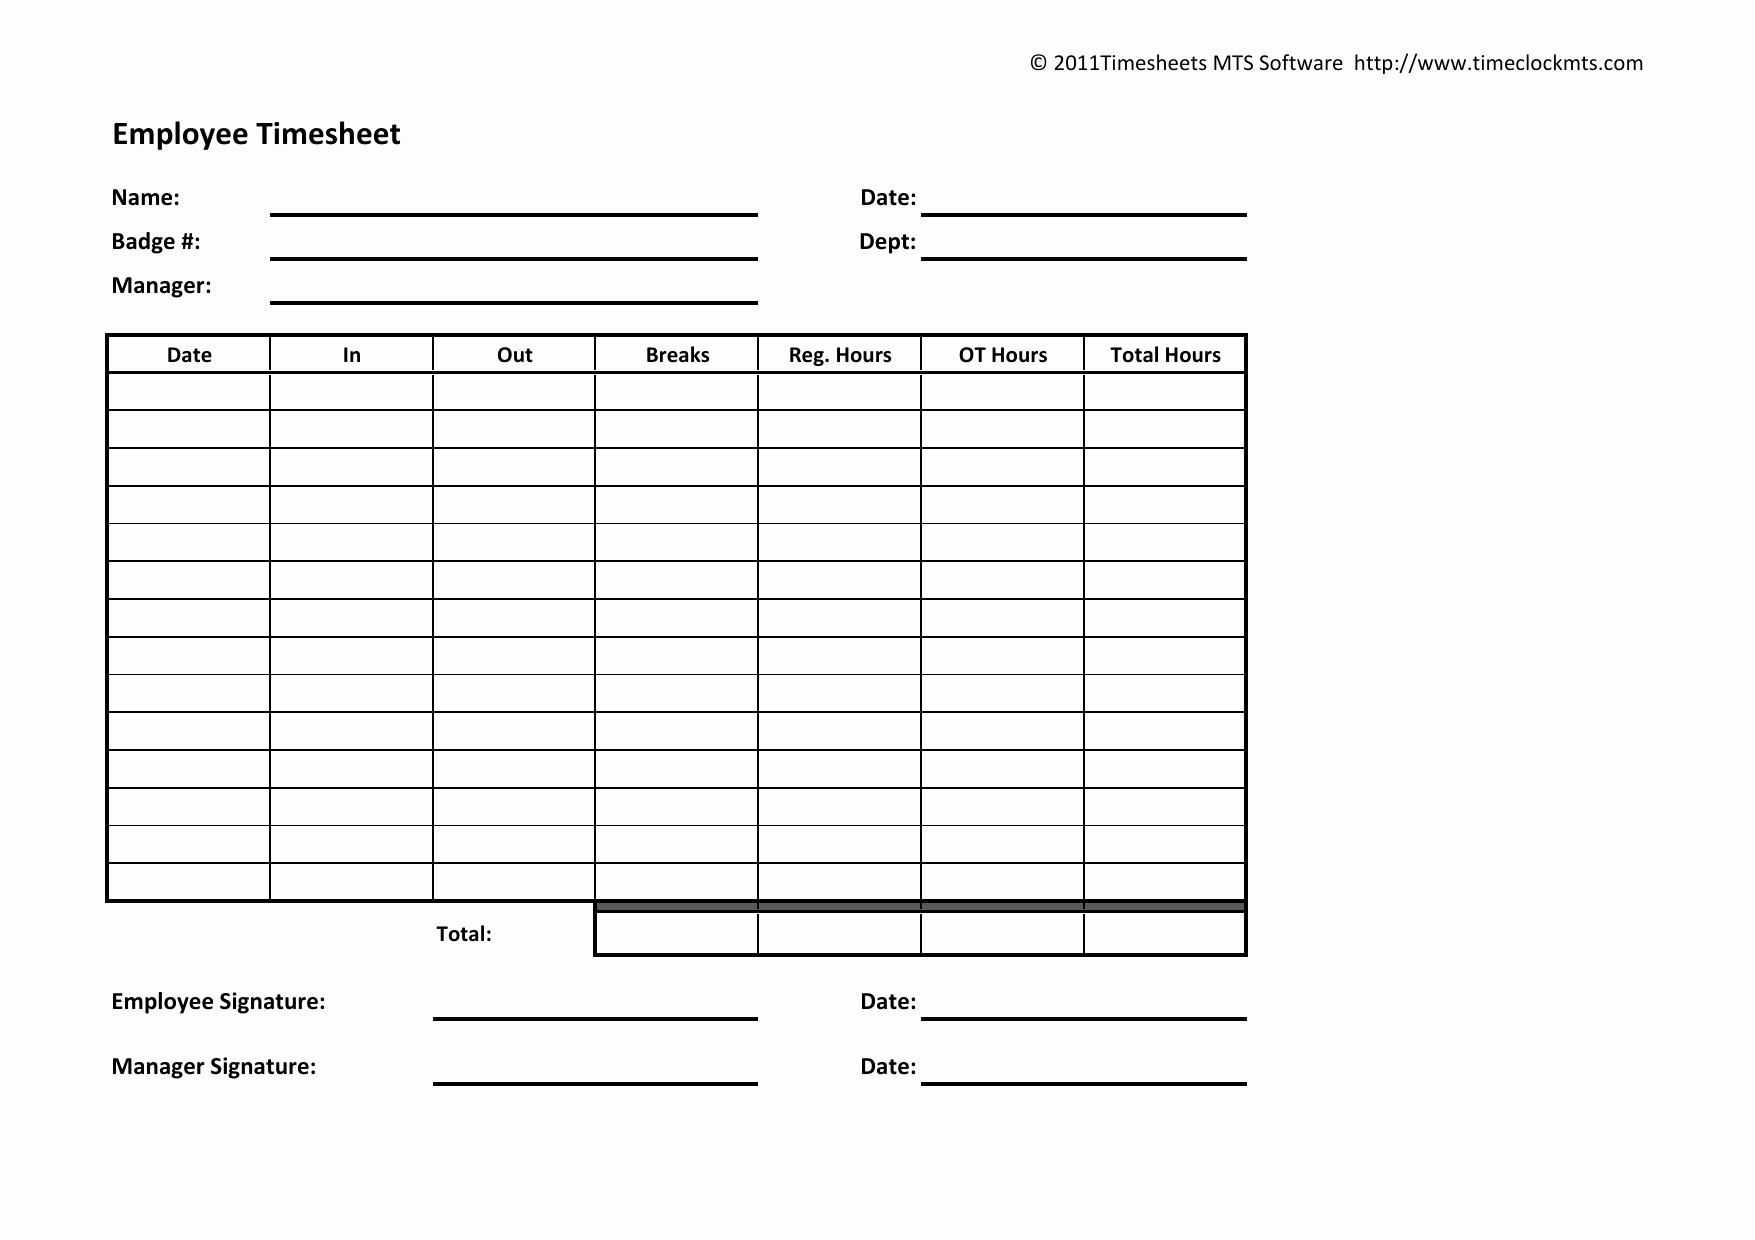 19 Memorable Free Timesheet Web Application Images - Time Sheets within Employee Timesheet Spreadsheet